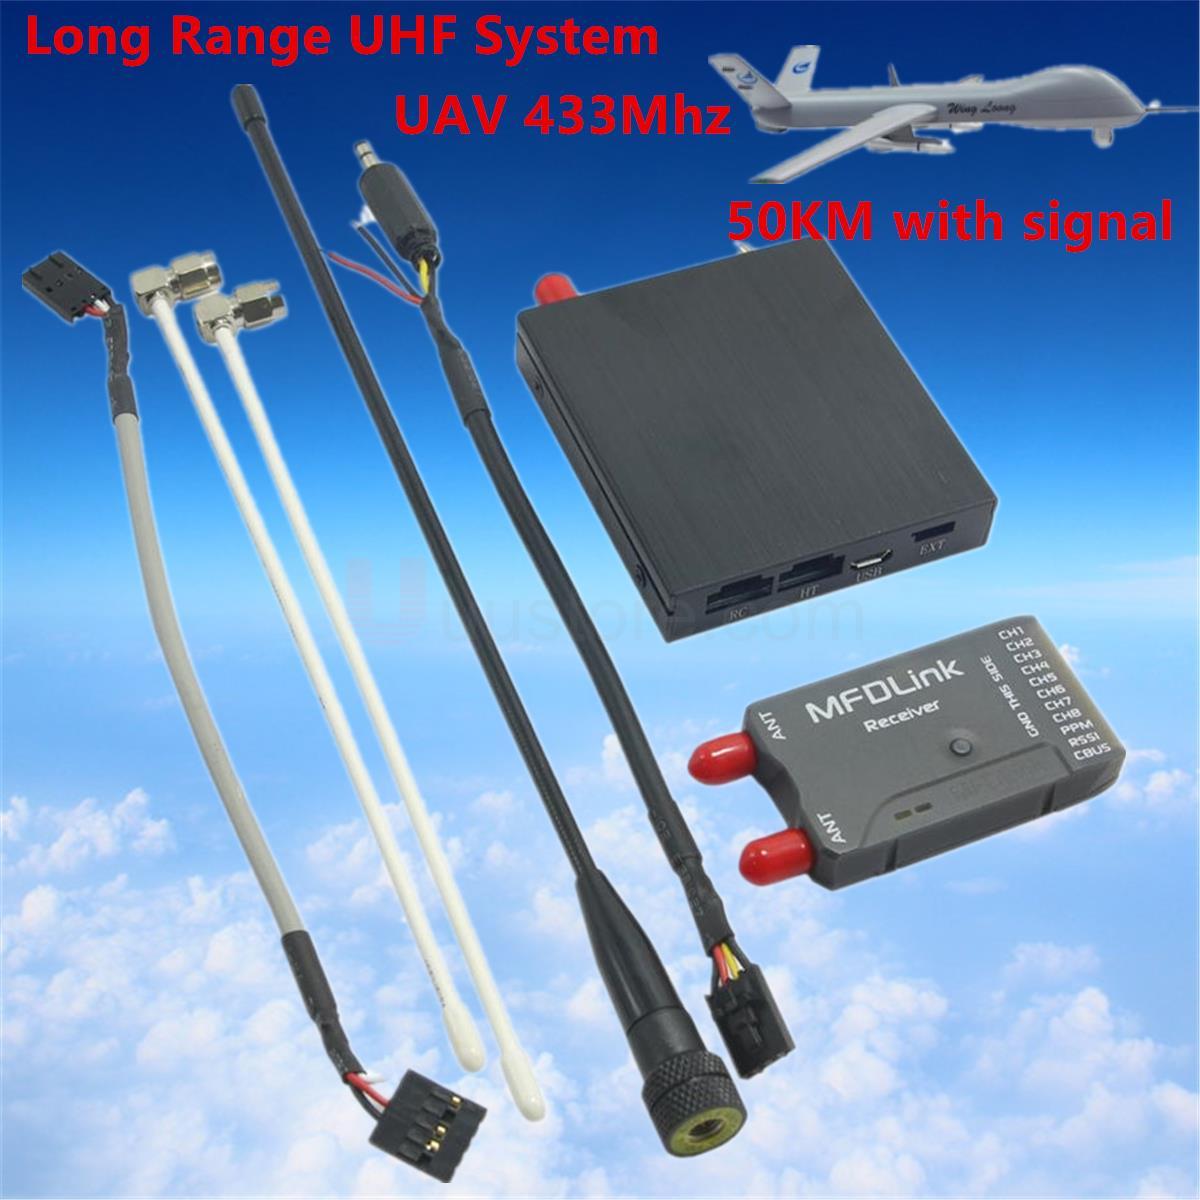 50KM Long Range MFDLink Rlink 433Mhz 16CH 1W RC FPV UHF System Transmitter W/8 Channel Receiver TX+RX Set For High Fpv Quality